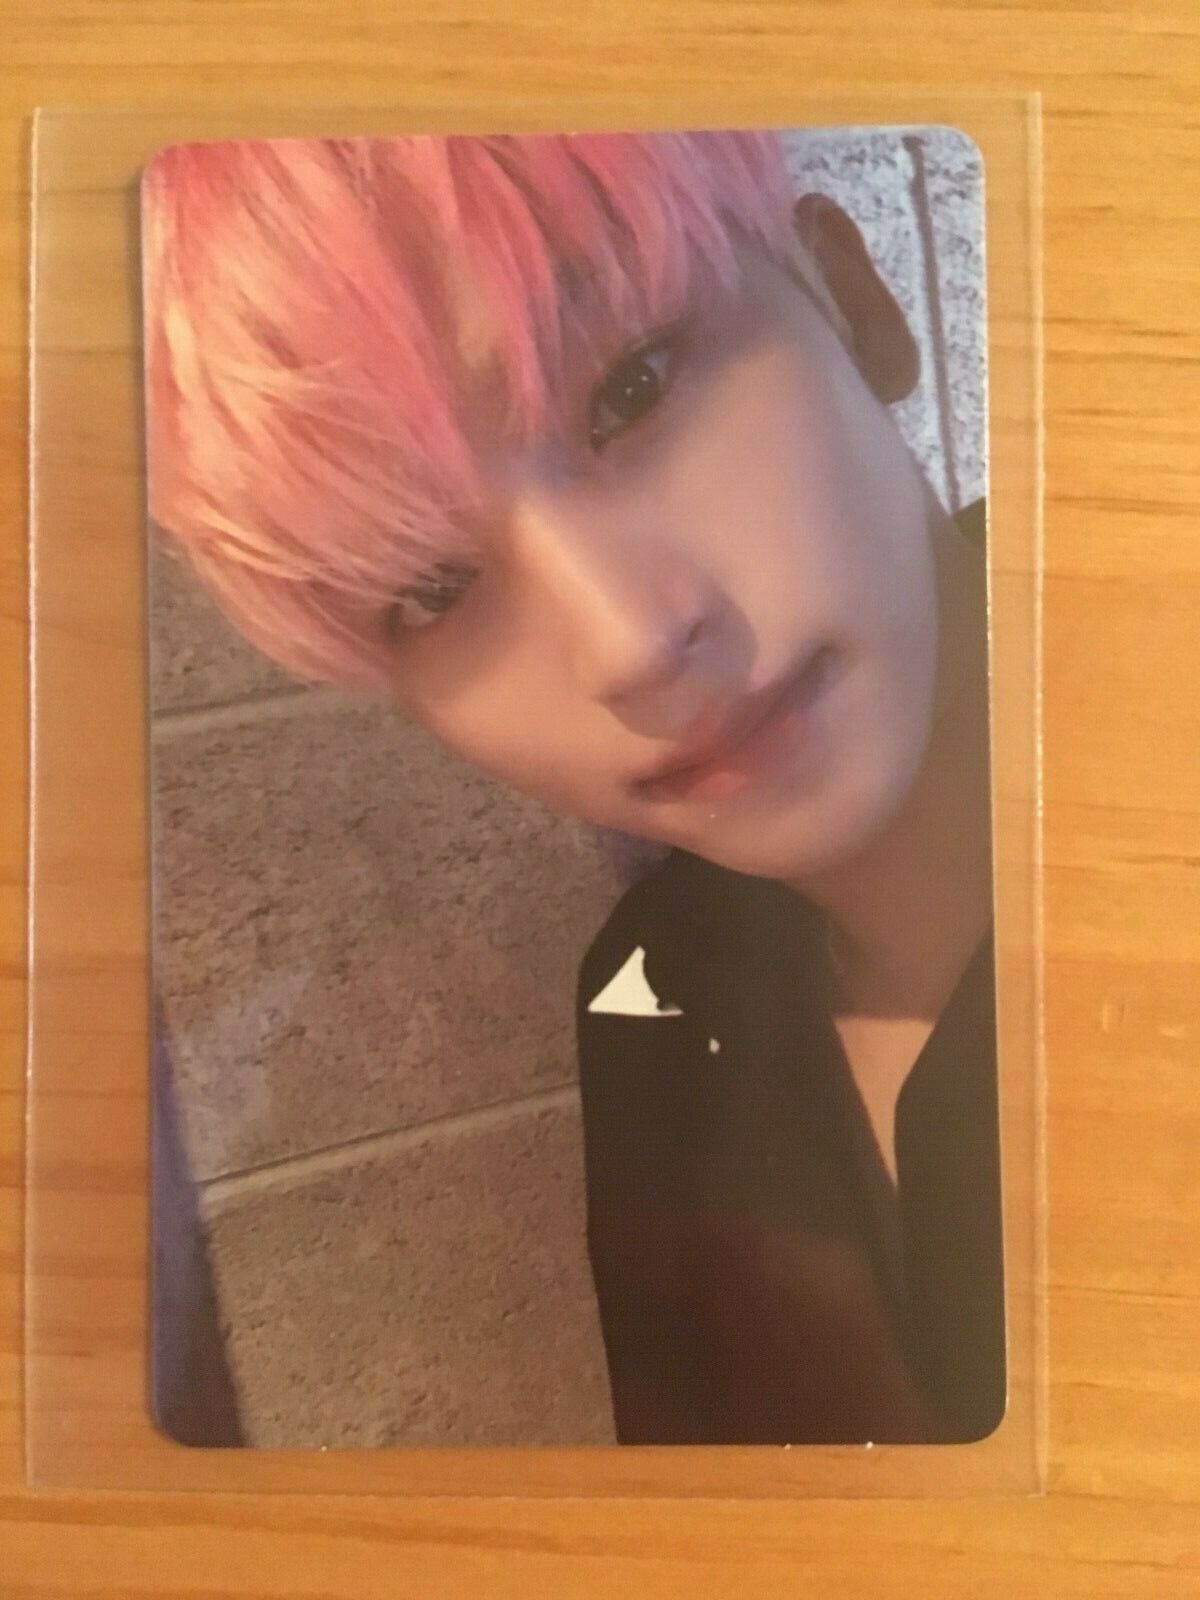 THE BOYZ - DREAMLIKE Official Photocards (MMT -limited- + DREAMLIKE + DAY + DIY) Sangyeon [Dreamlike}